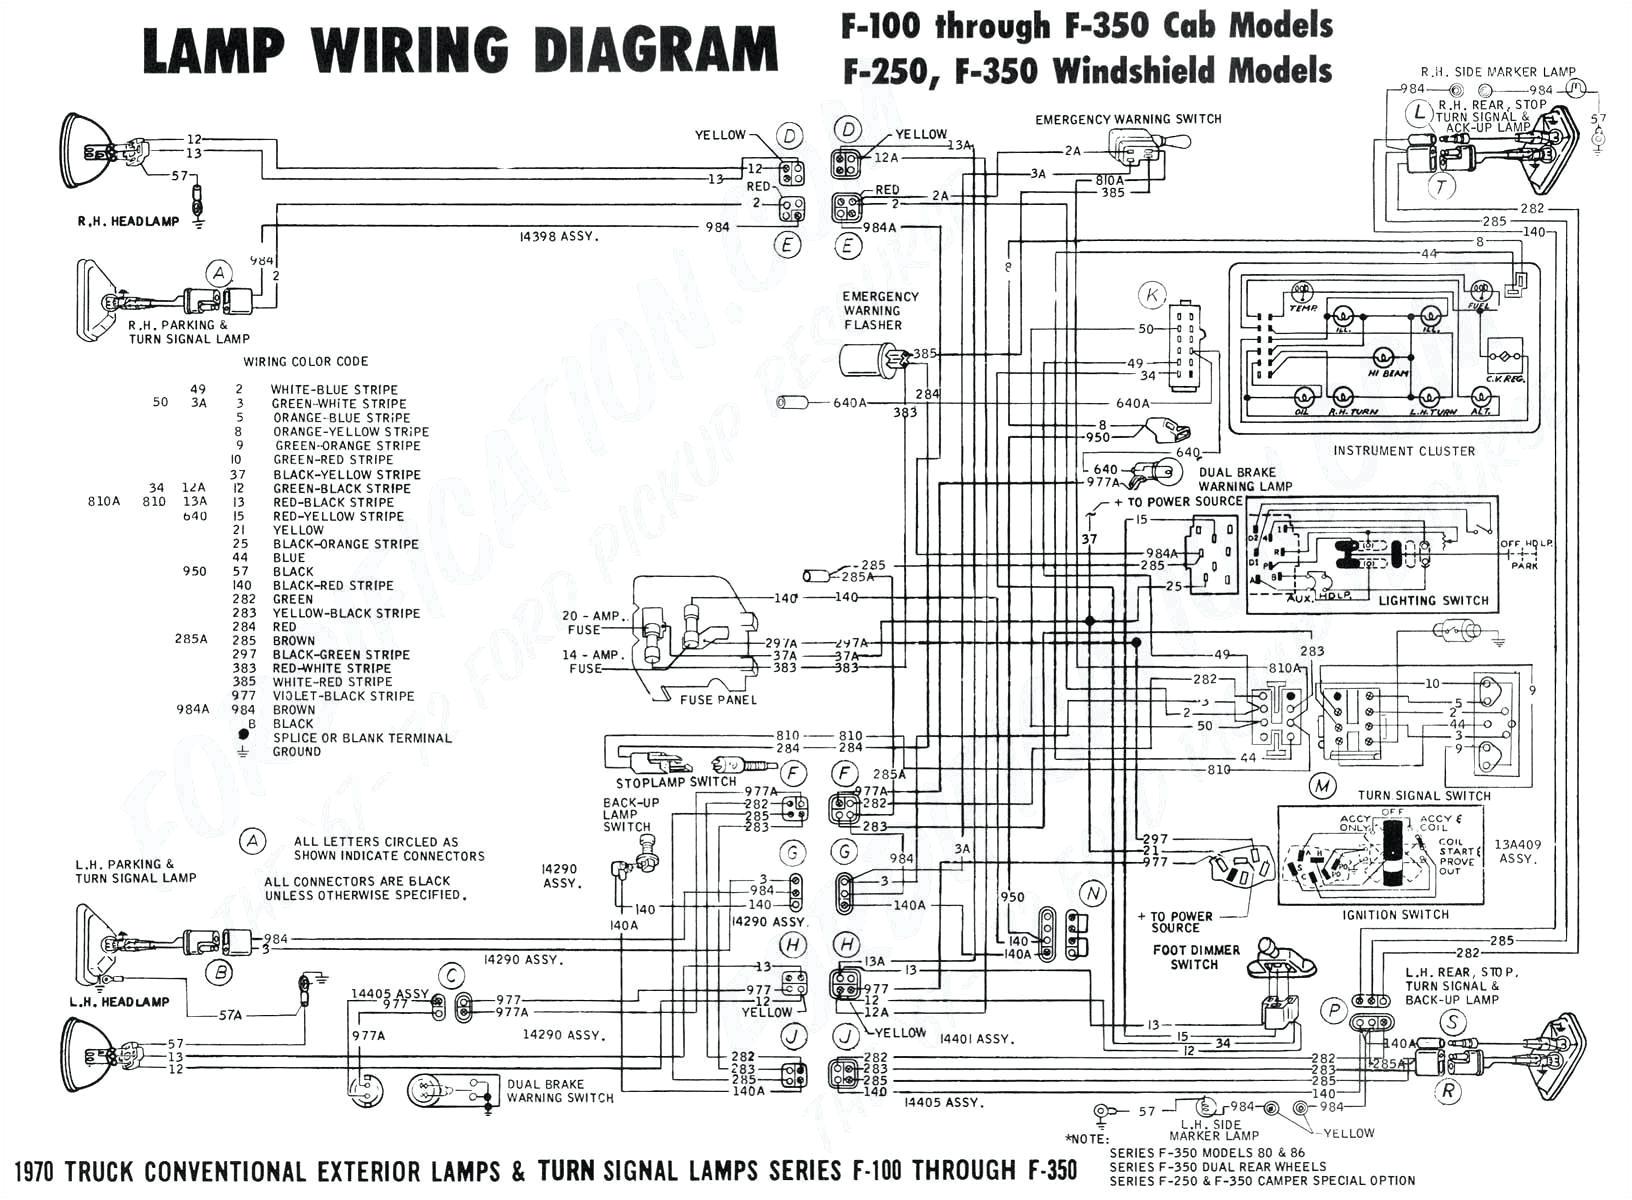 fleetwood wiring diagrams fresh fleetwood motorhome wiring diagram unique coachman motorhome wiring